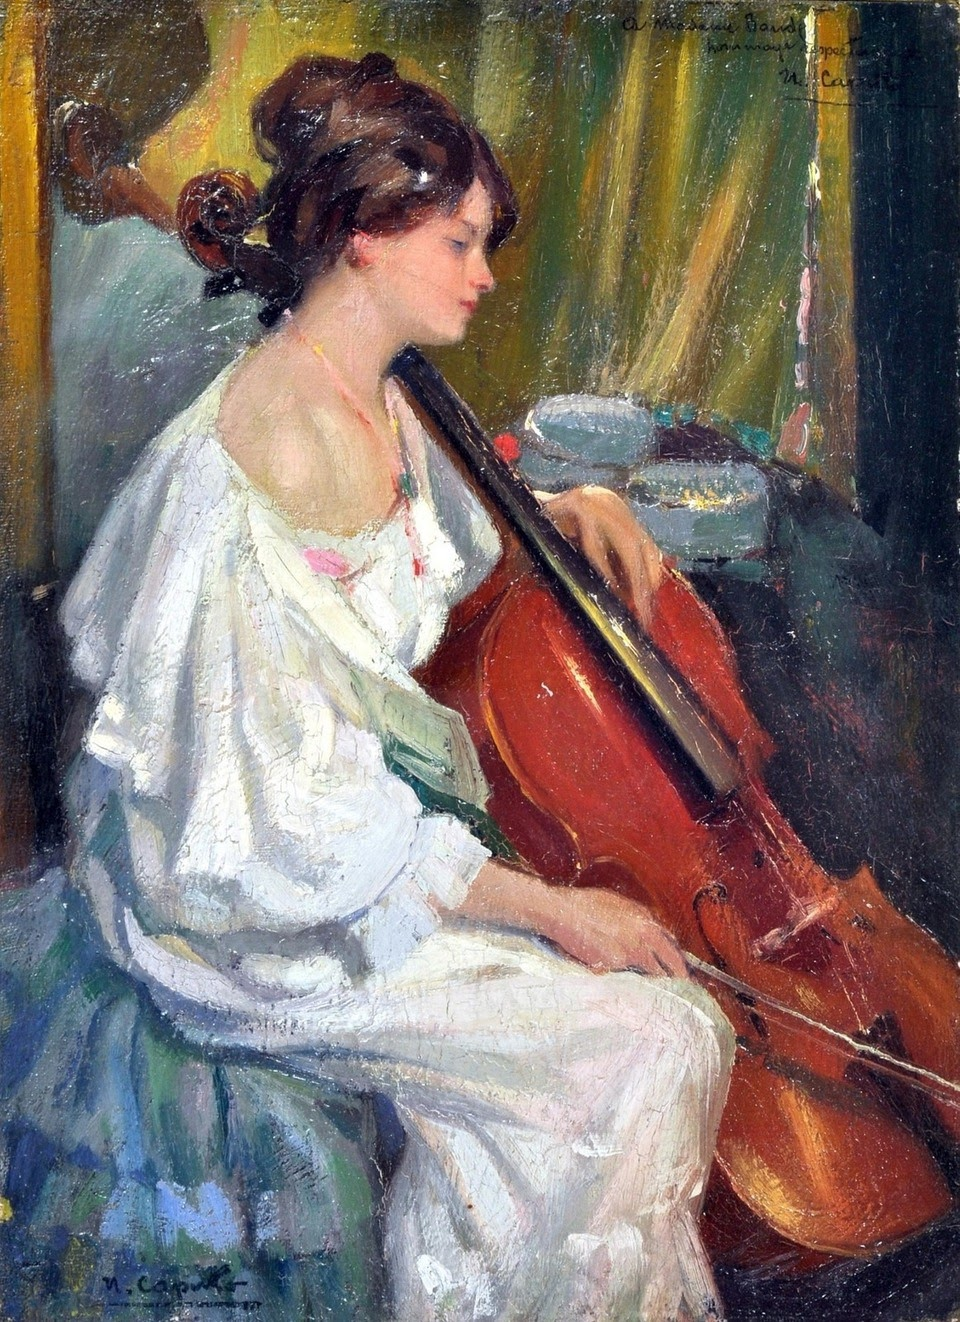 Ulisse Caputo La violoncellista